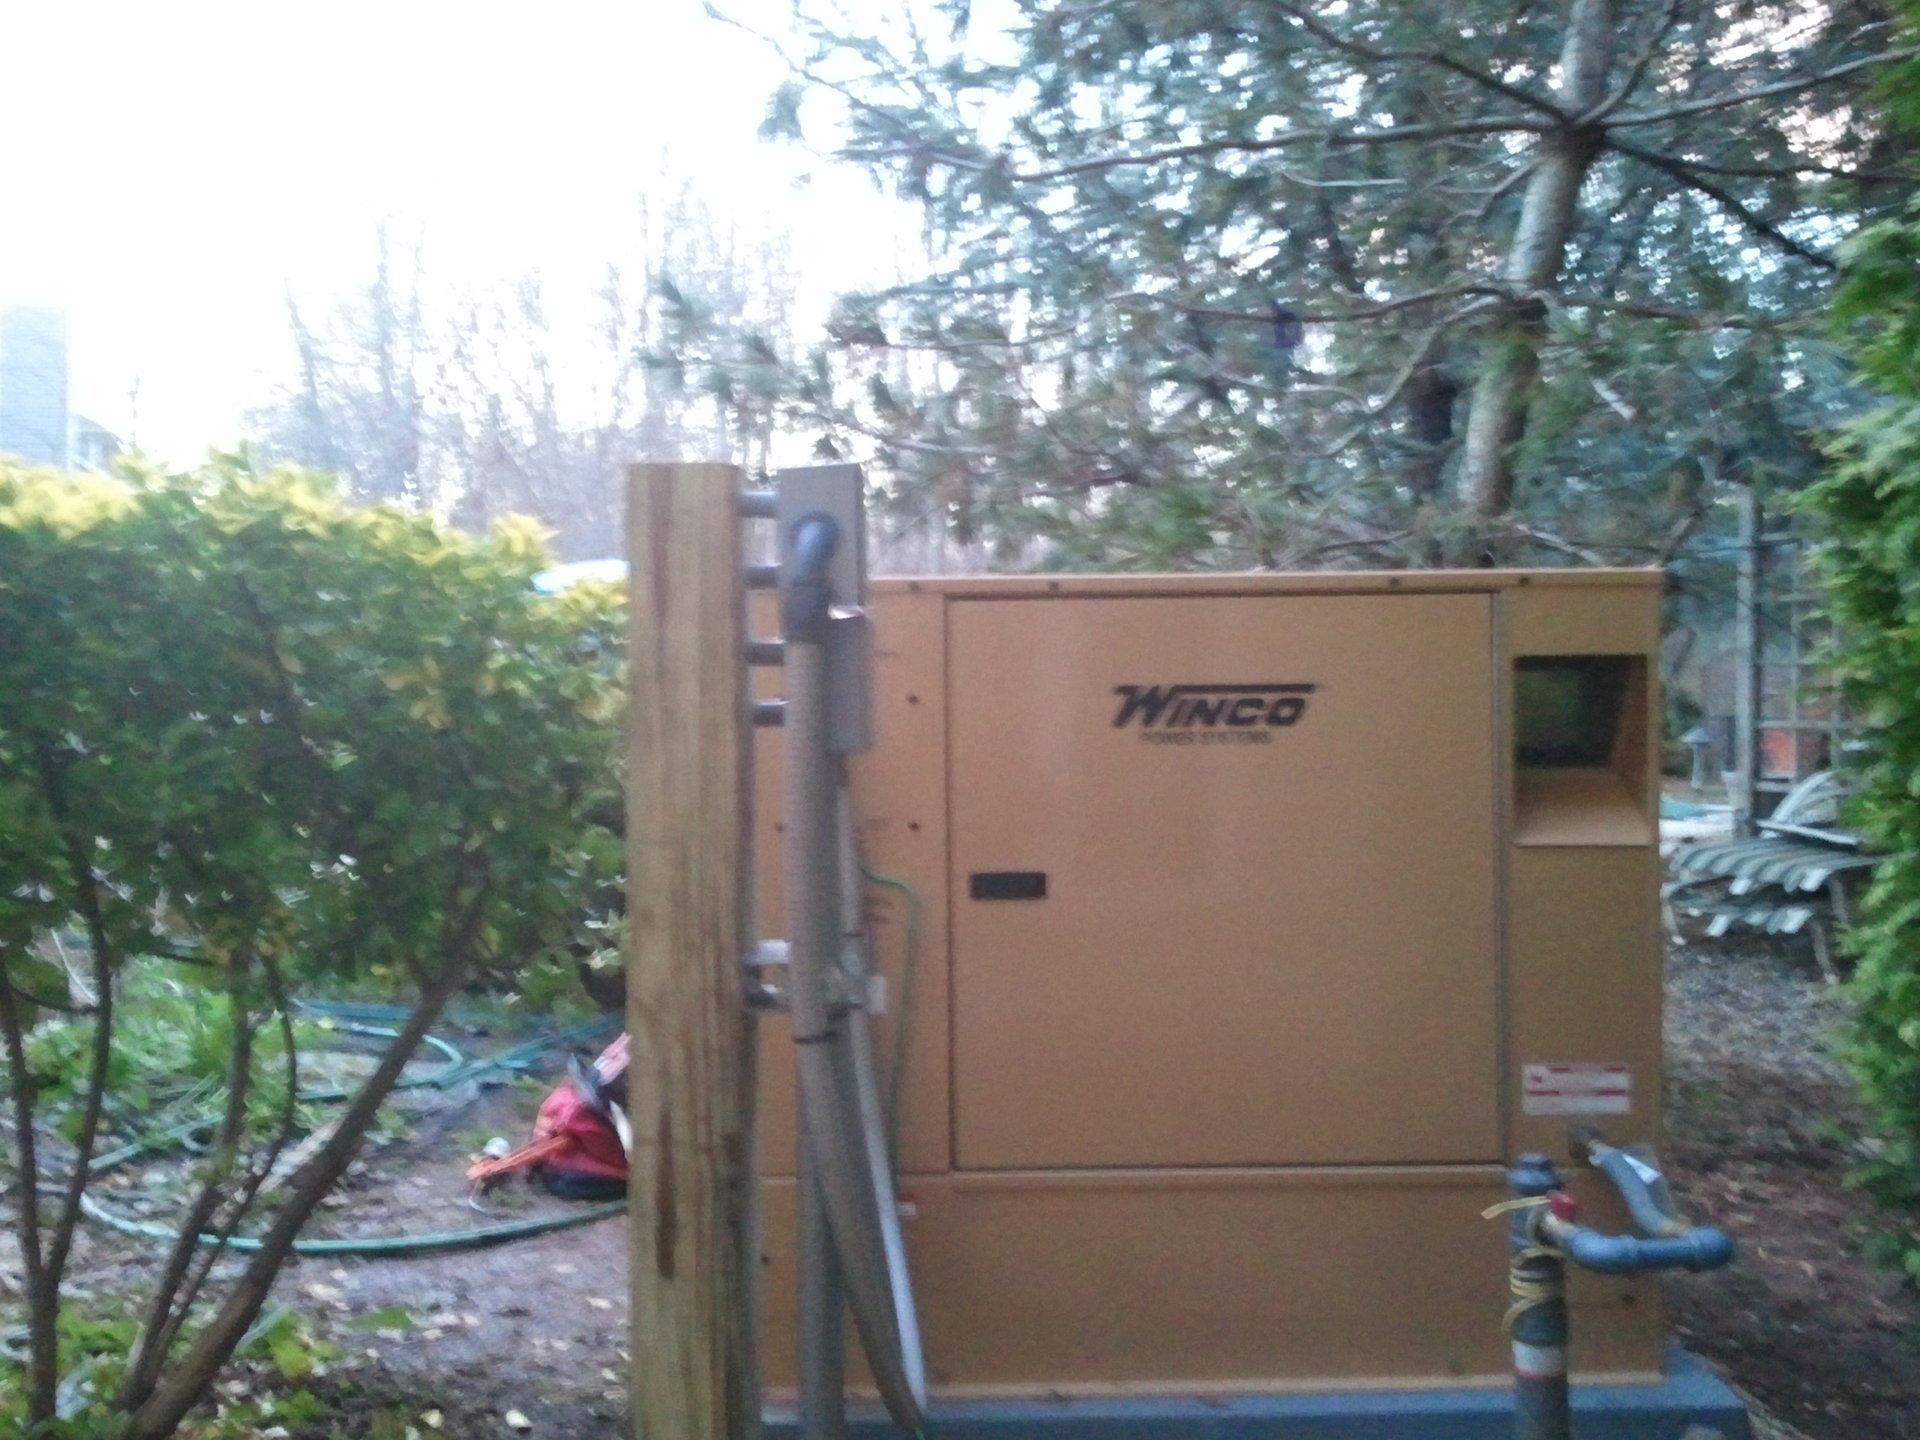 12 Kw Winco Generator